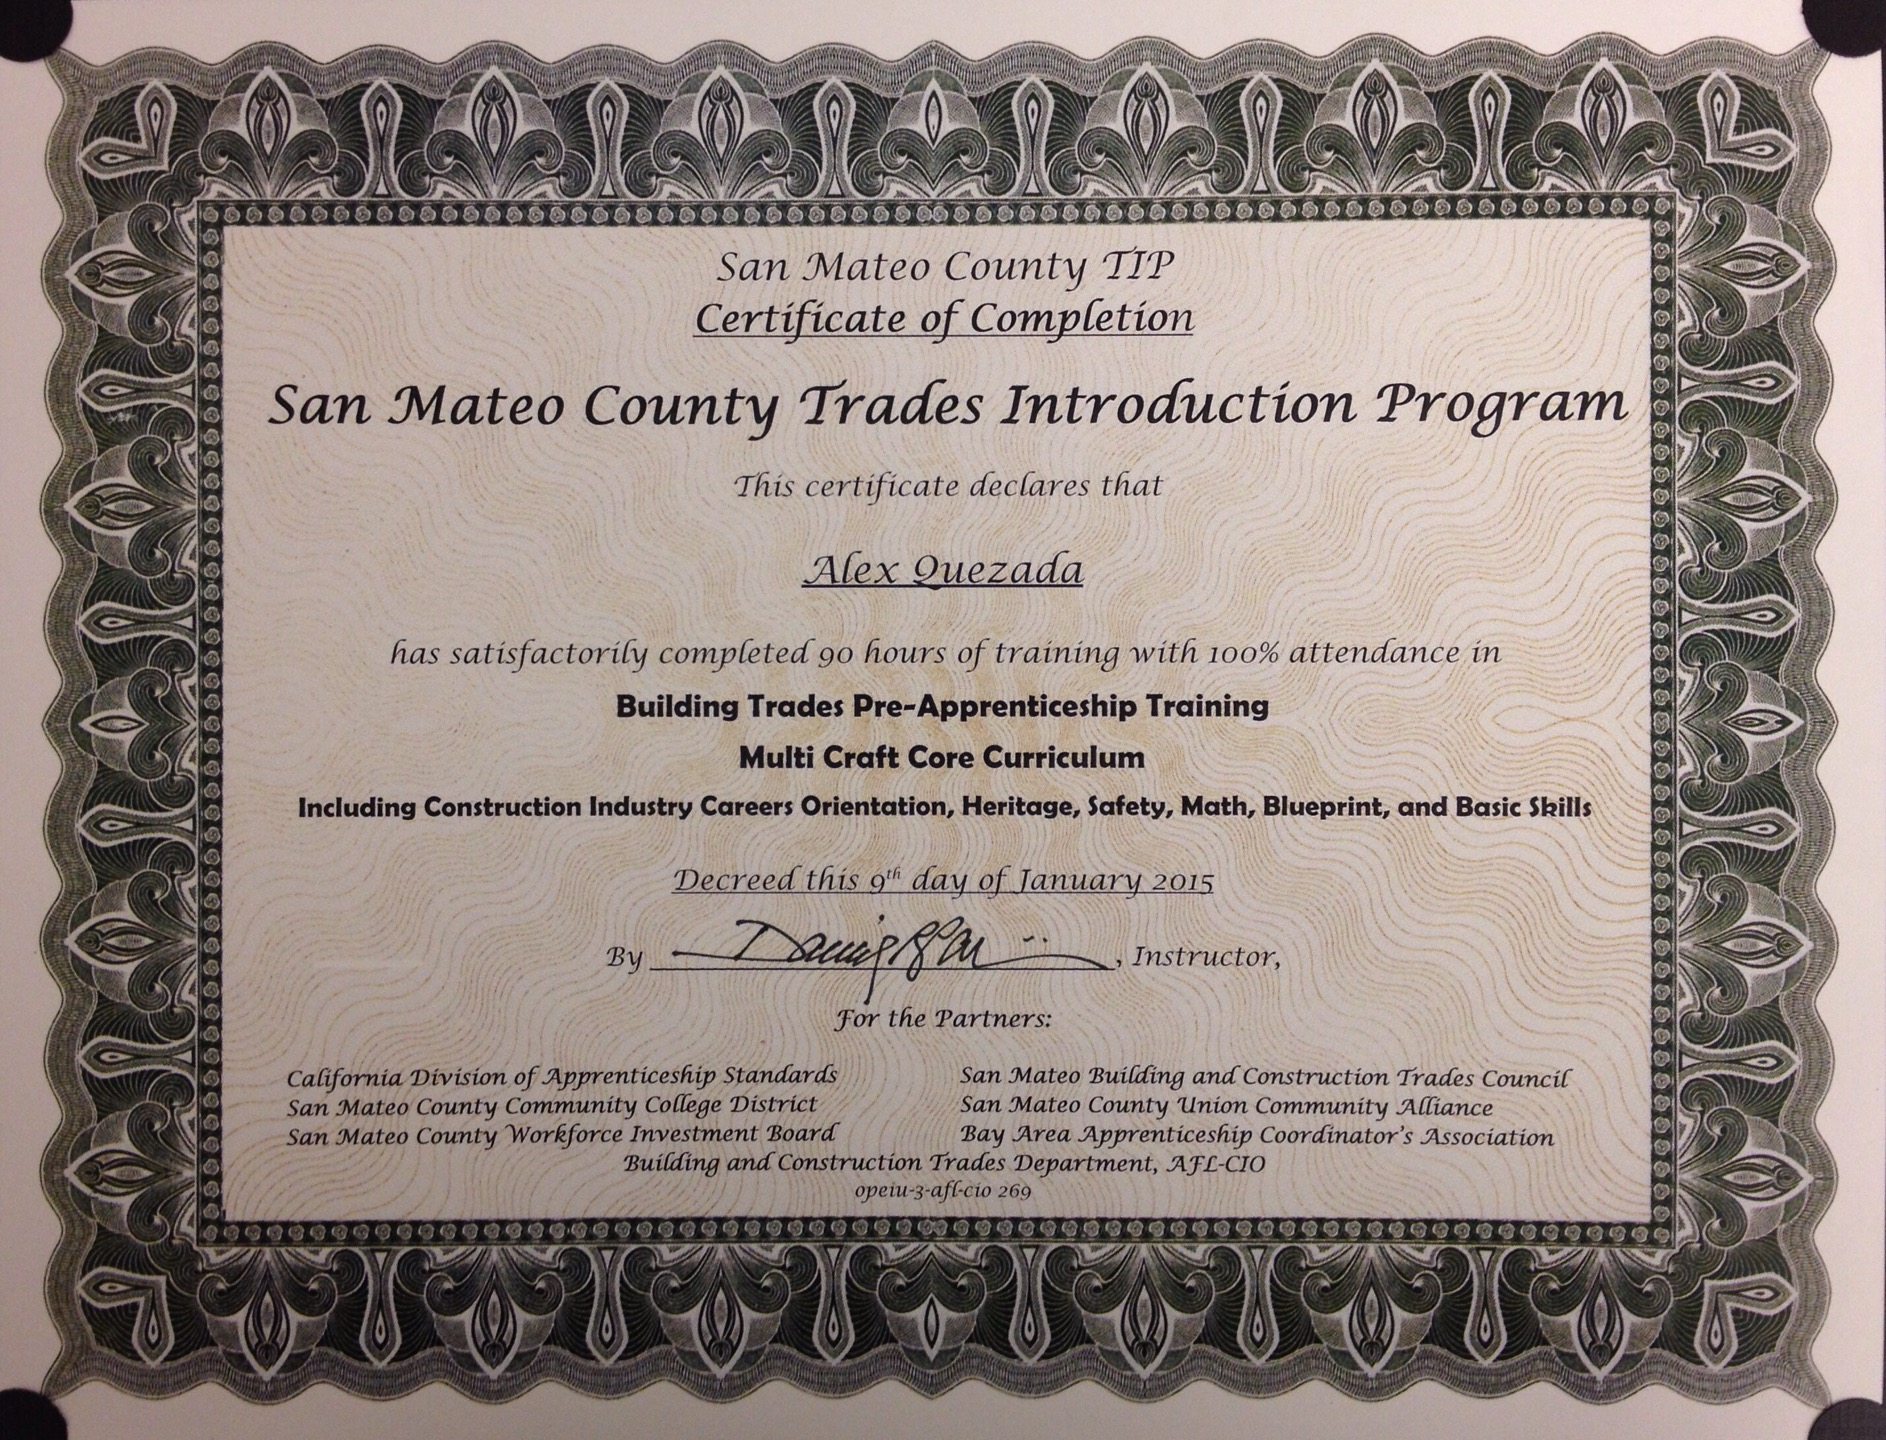 International Brotherhood of Electrical Workers   1701 Leslie St, San Mateo, CA, 94402   +1 (650) 574-4239